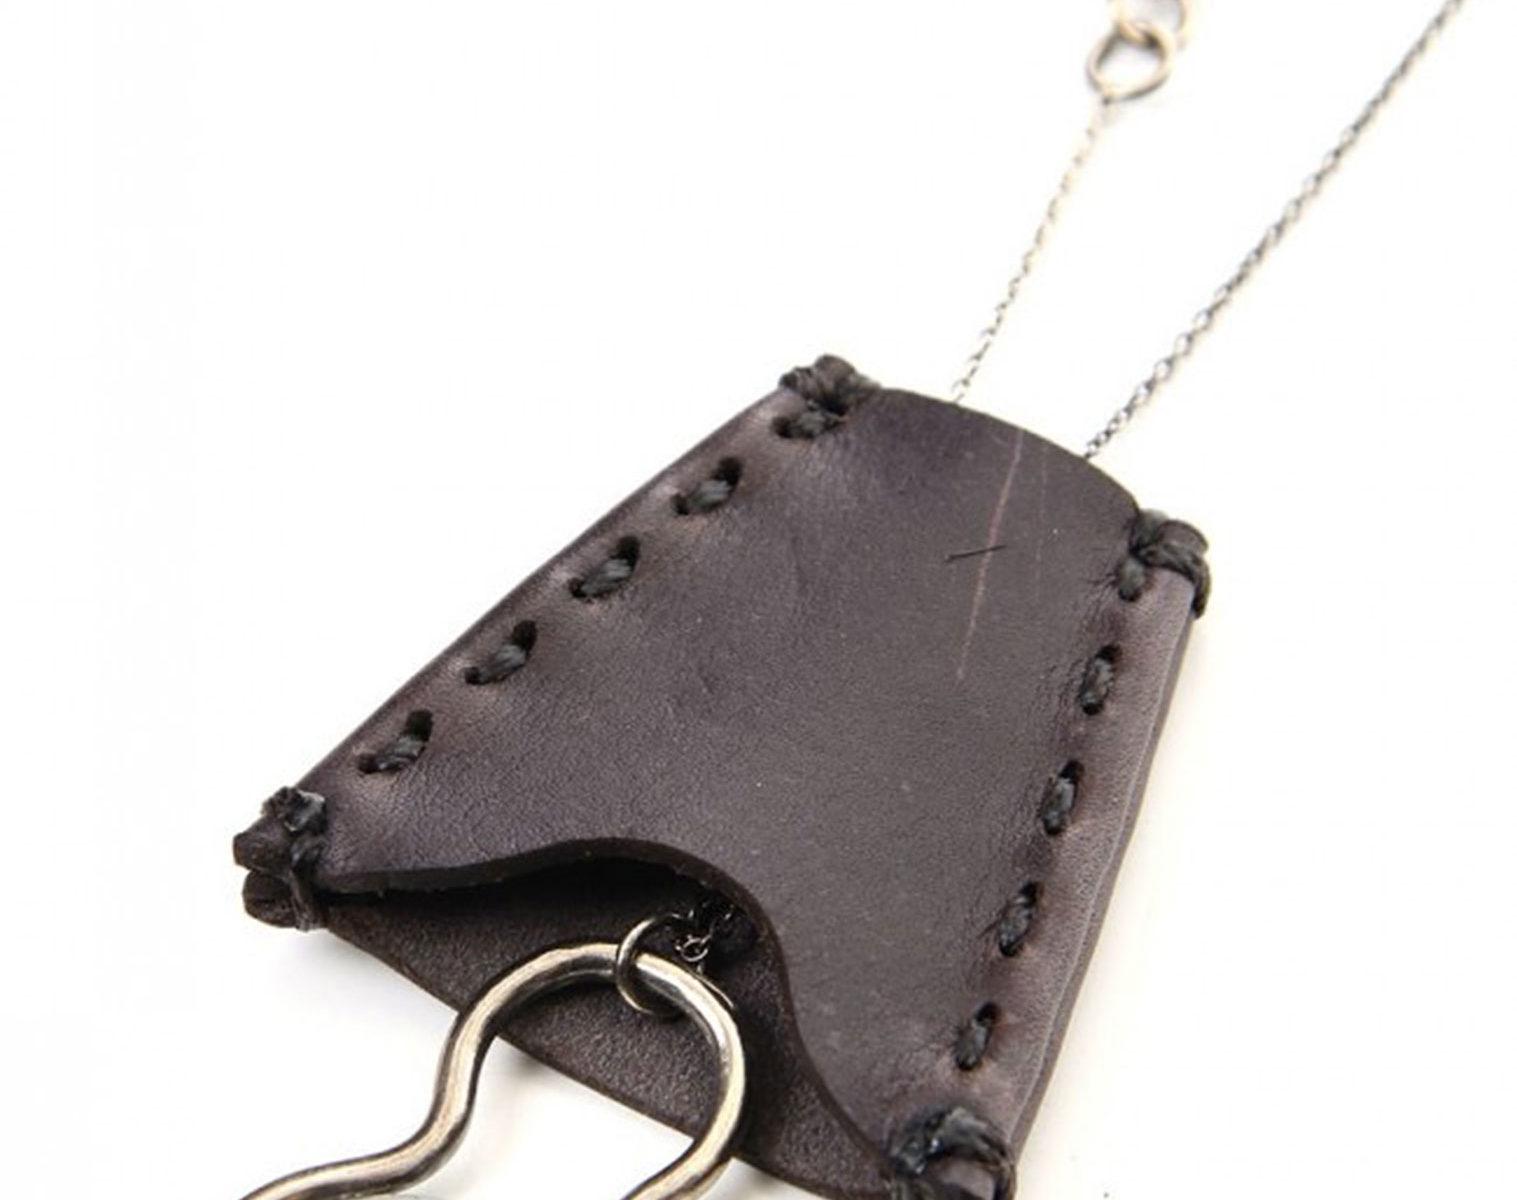 DEVOA Magnifying Glass Necklace 1